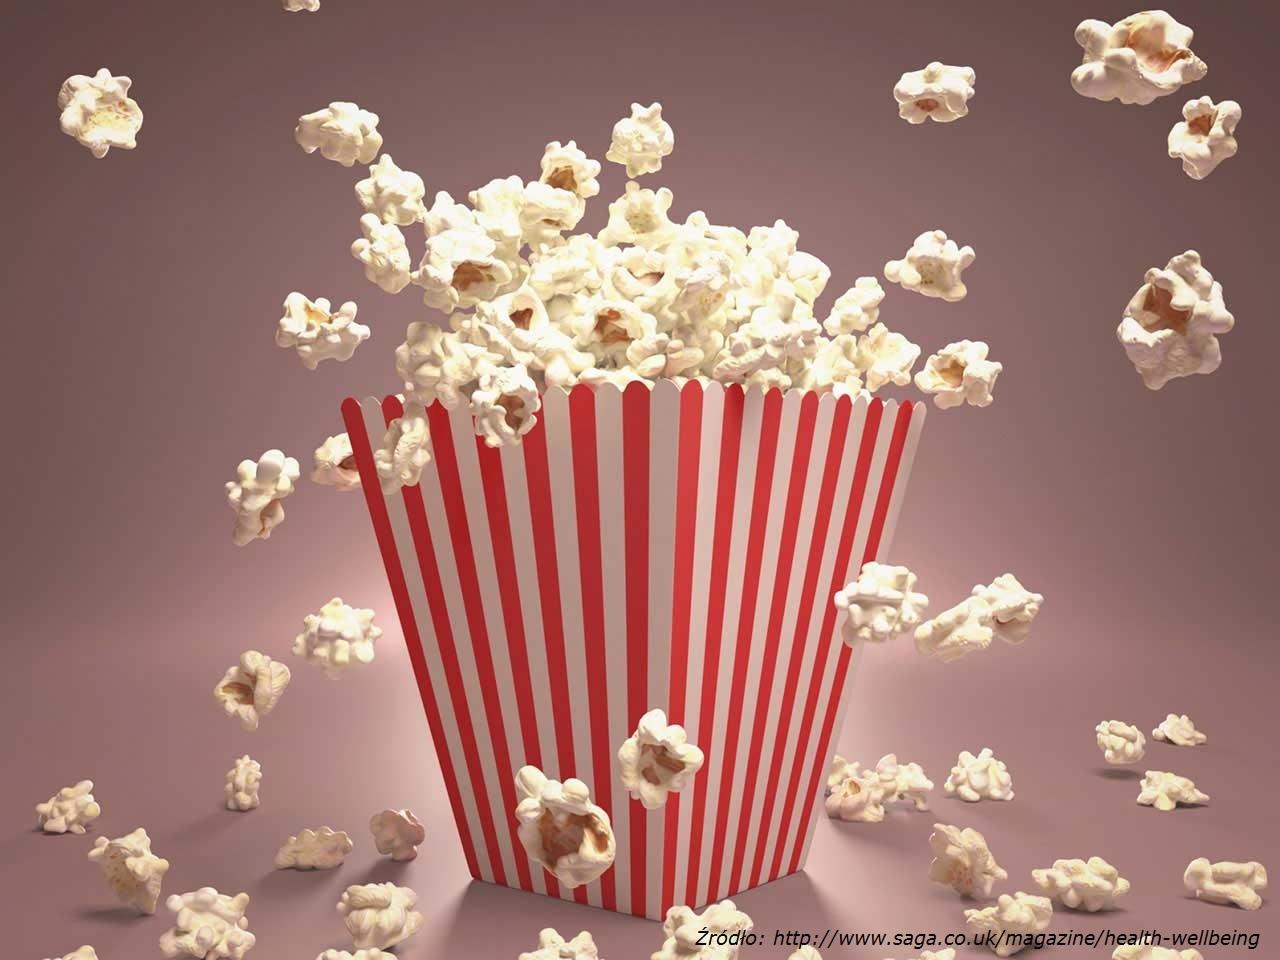 popcorn-and-raisins